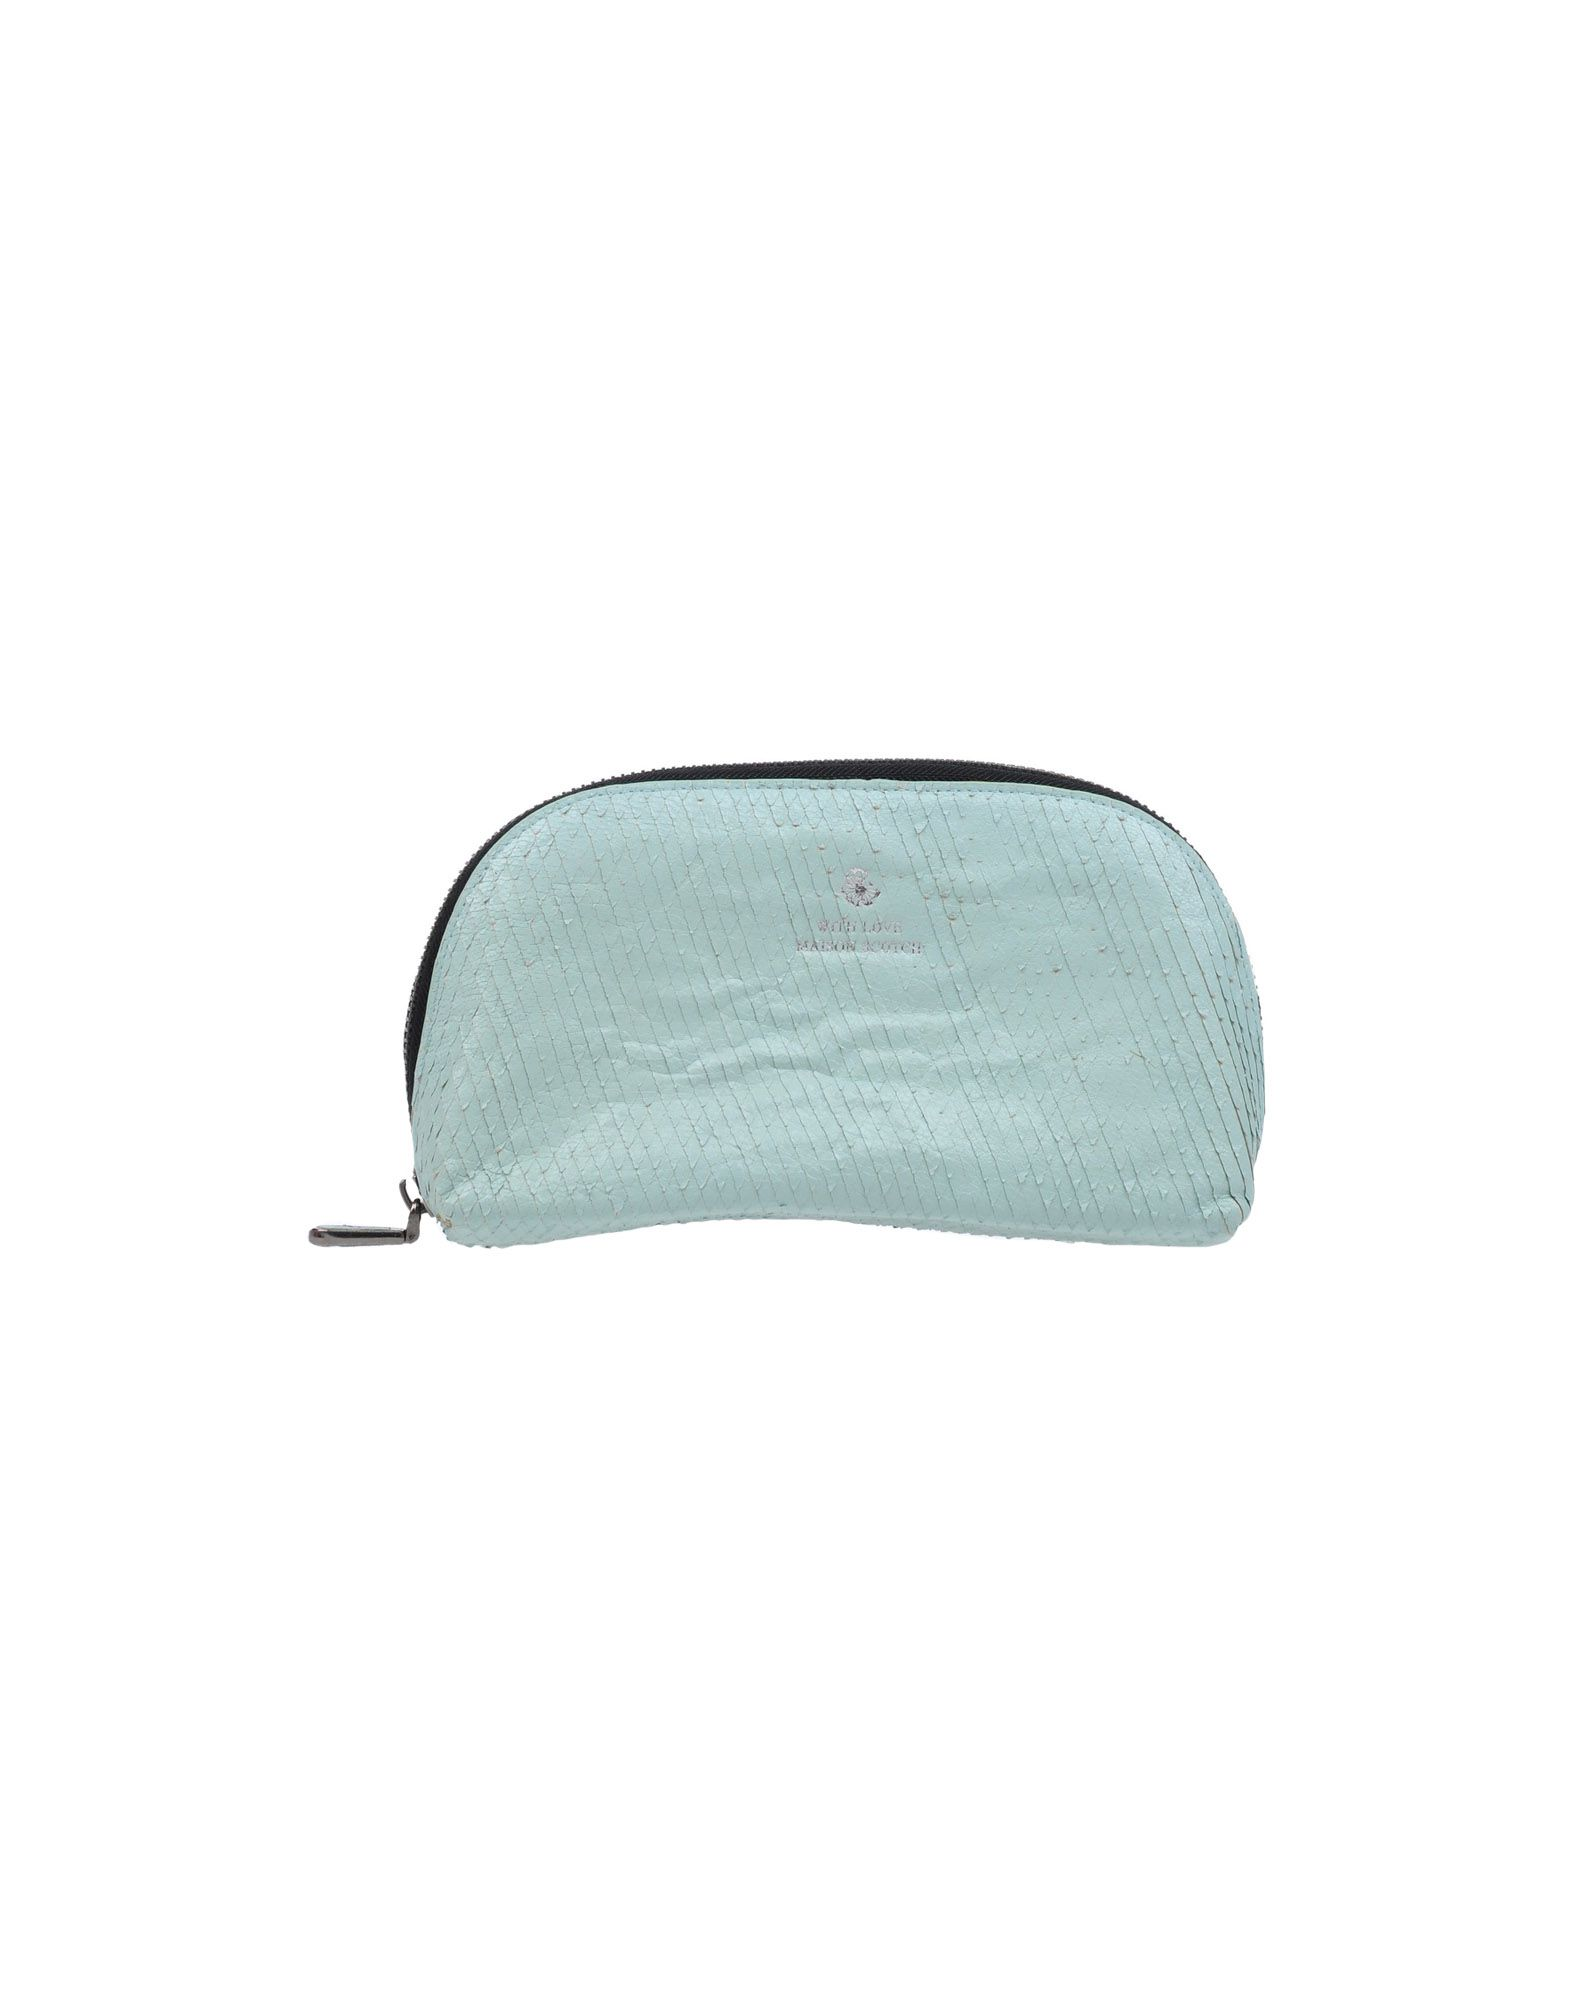 Фото - MAISON SCOTCH Beauty case women cosmetic bag travel lattice pattern makeup case zipper make up bags organizer storage pouch toiletry kit wash beauty bags